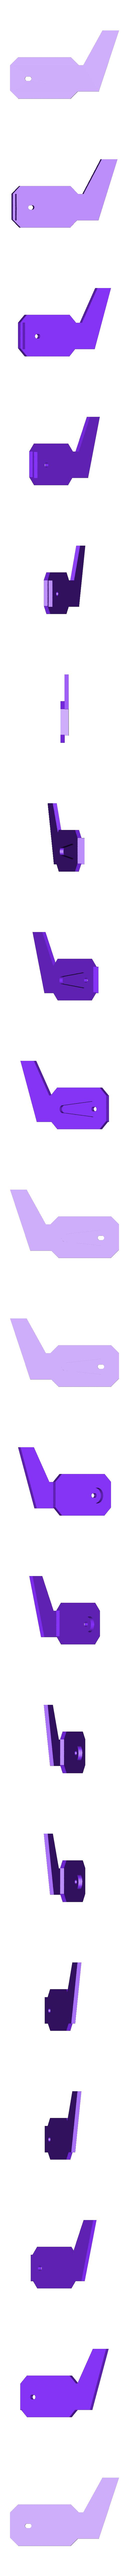 l_leg.stl Download free STL file Crab-like Arduino automaton • 3D printing template, indigo4